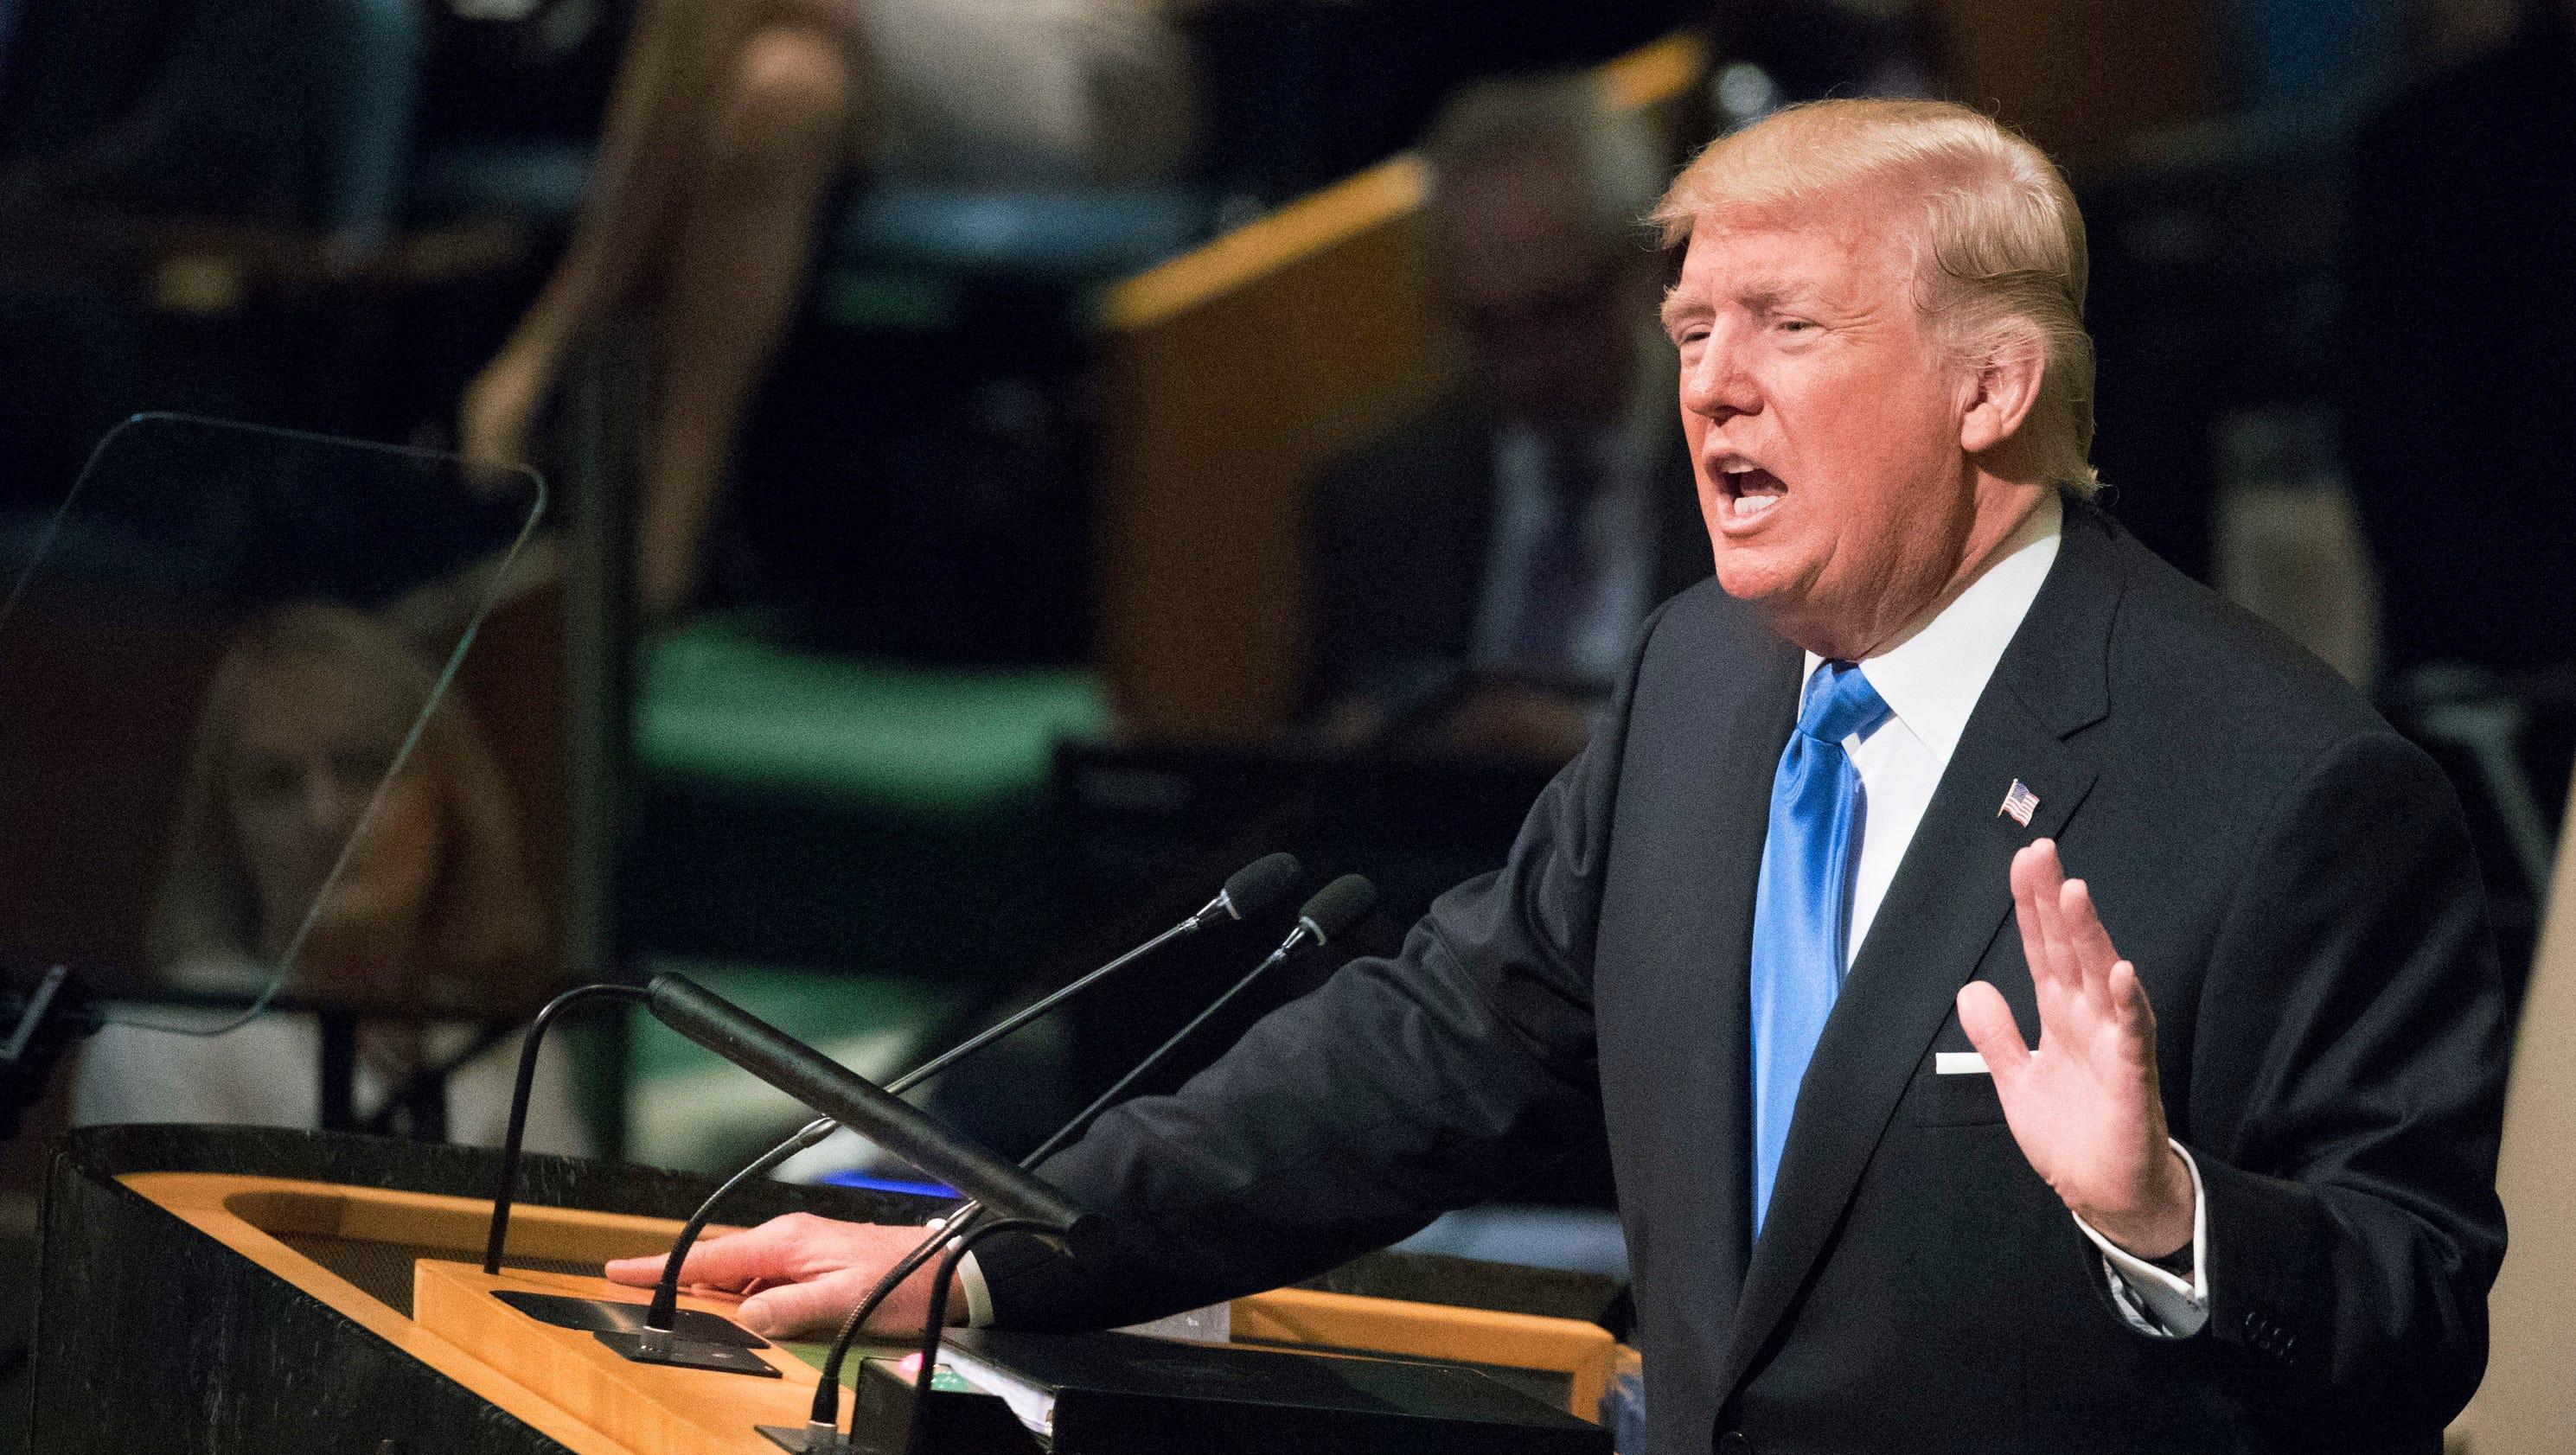 At U.N., Trump's 'me first' doctrine abandons Truman's postwar 'security for all'